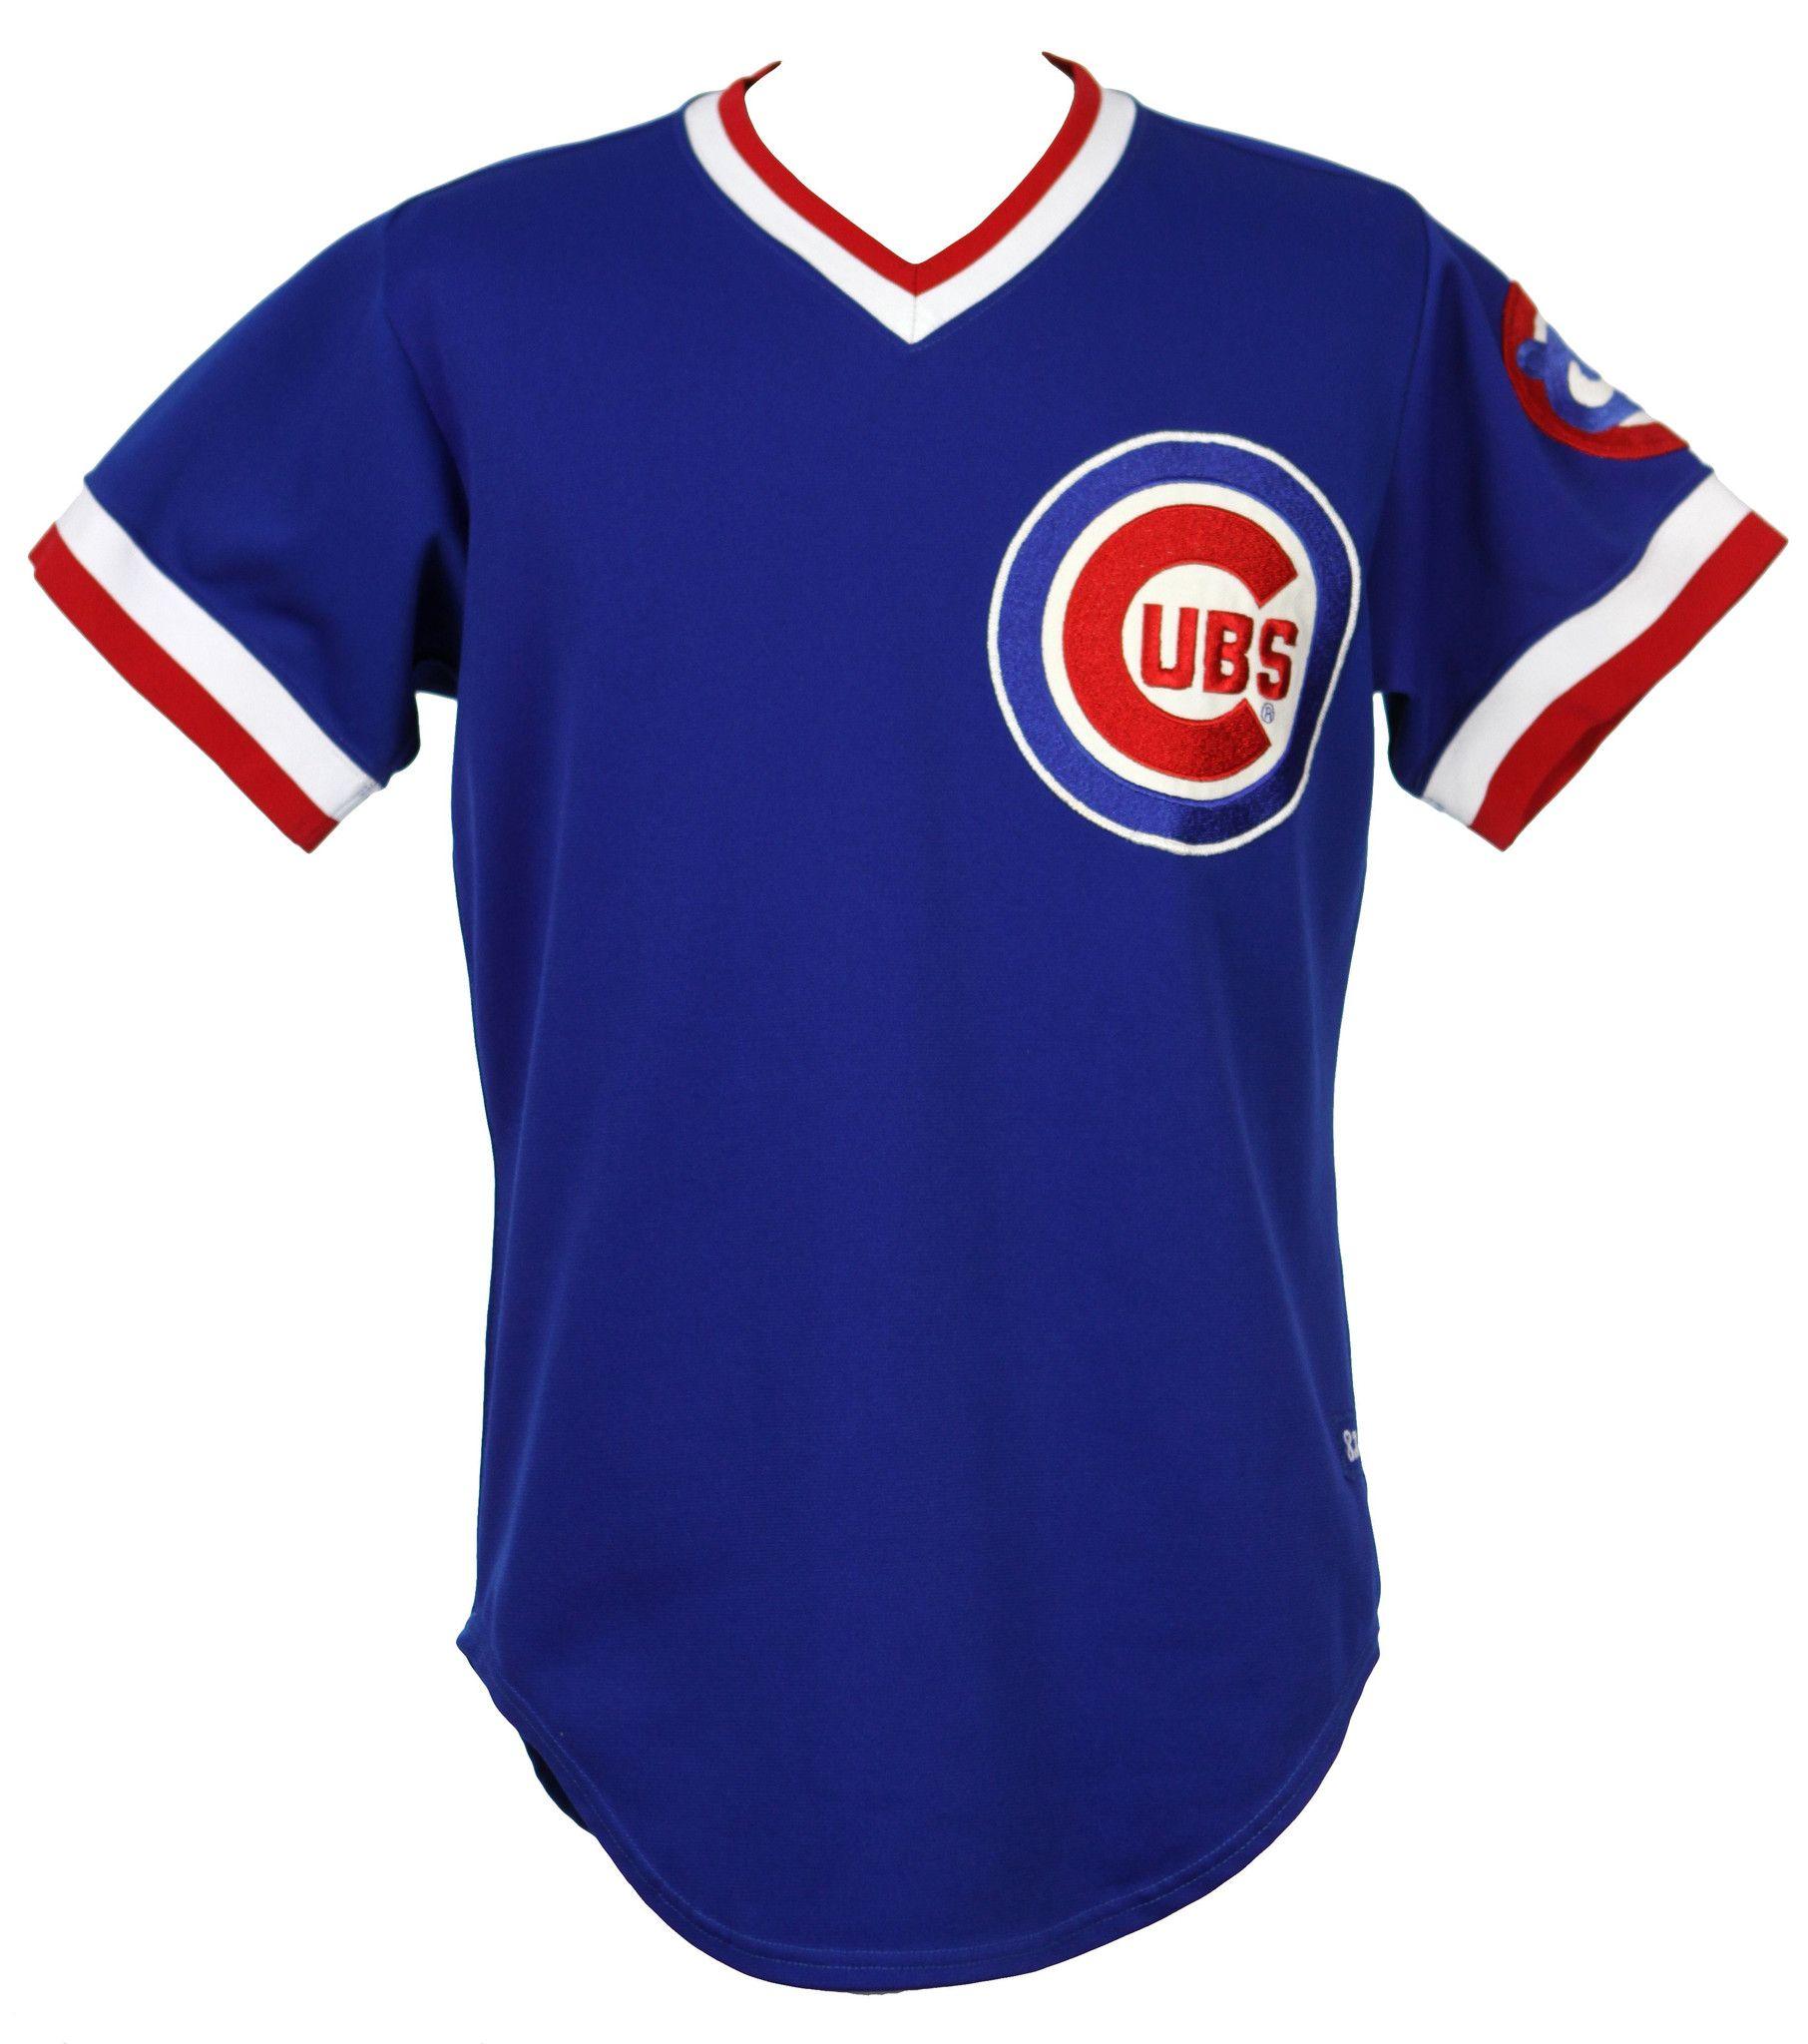 18865a9e7 CHICAGO CUBS 1984 ROAD REPLICA JERSEY-MAJ  ChicagoCubs  Cubs  CubsFans   GoCubs  Chicago